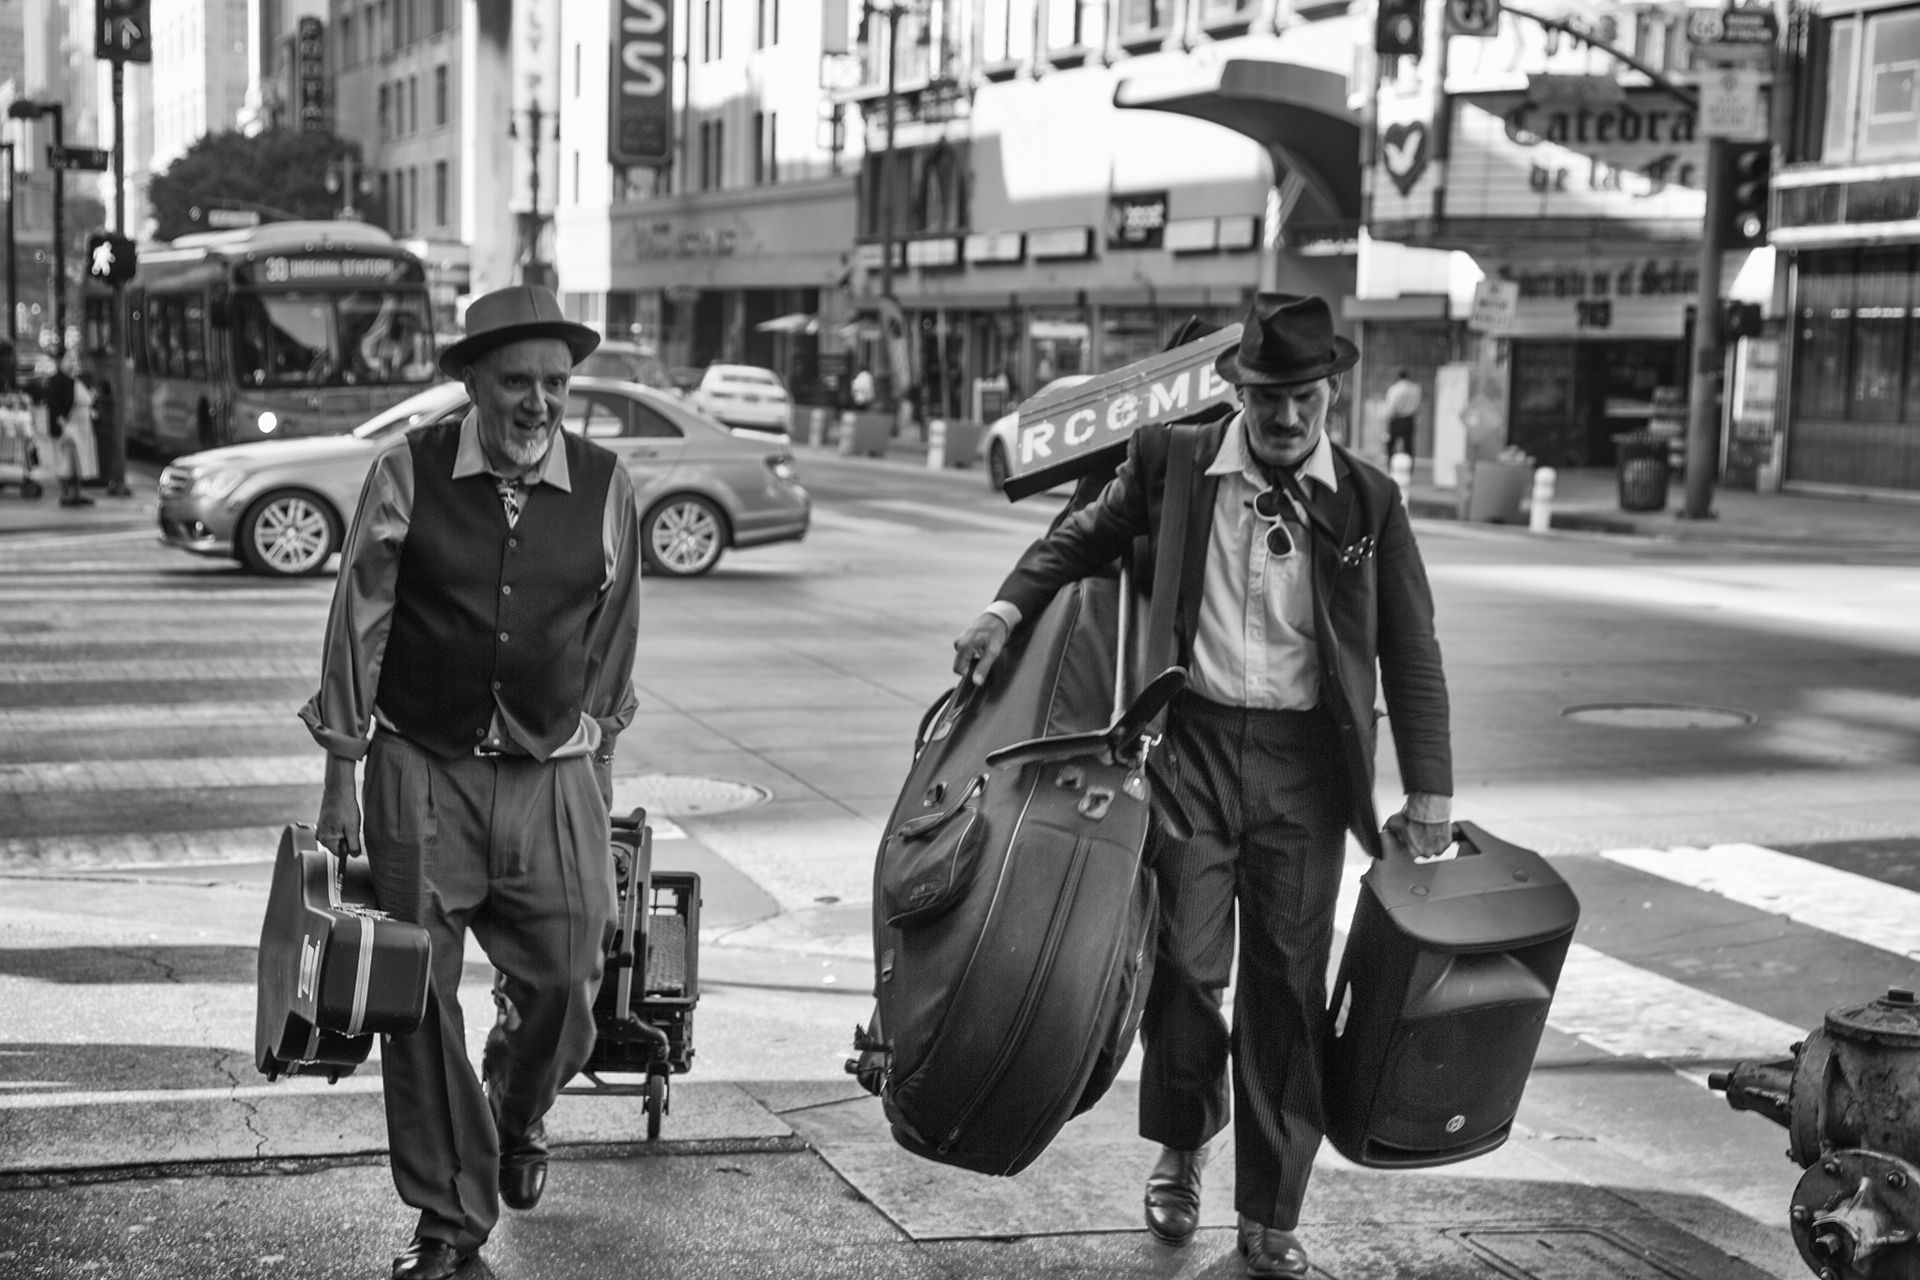 L.A. Street Photography